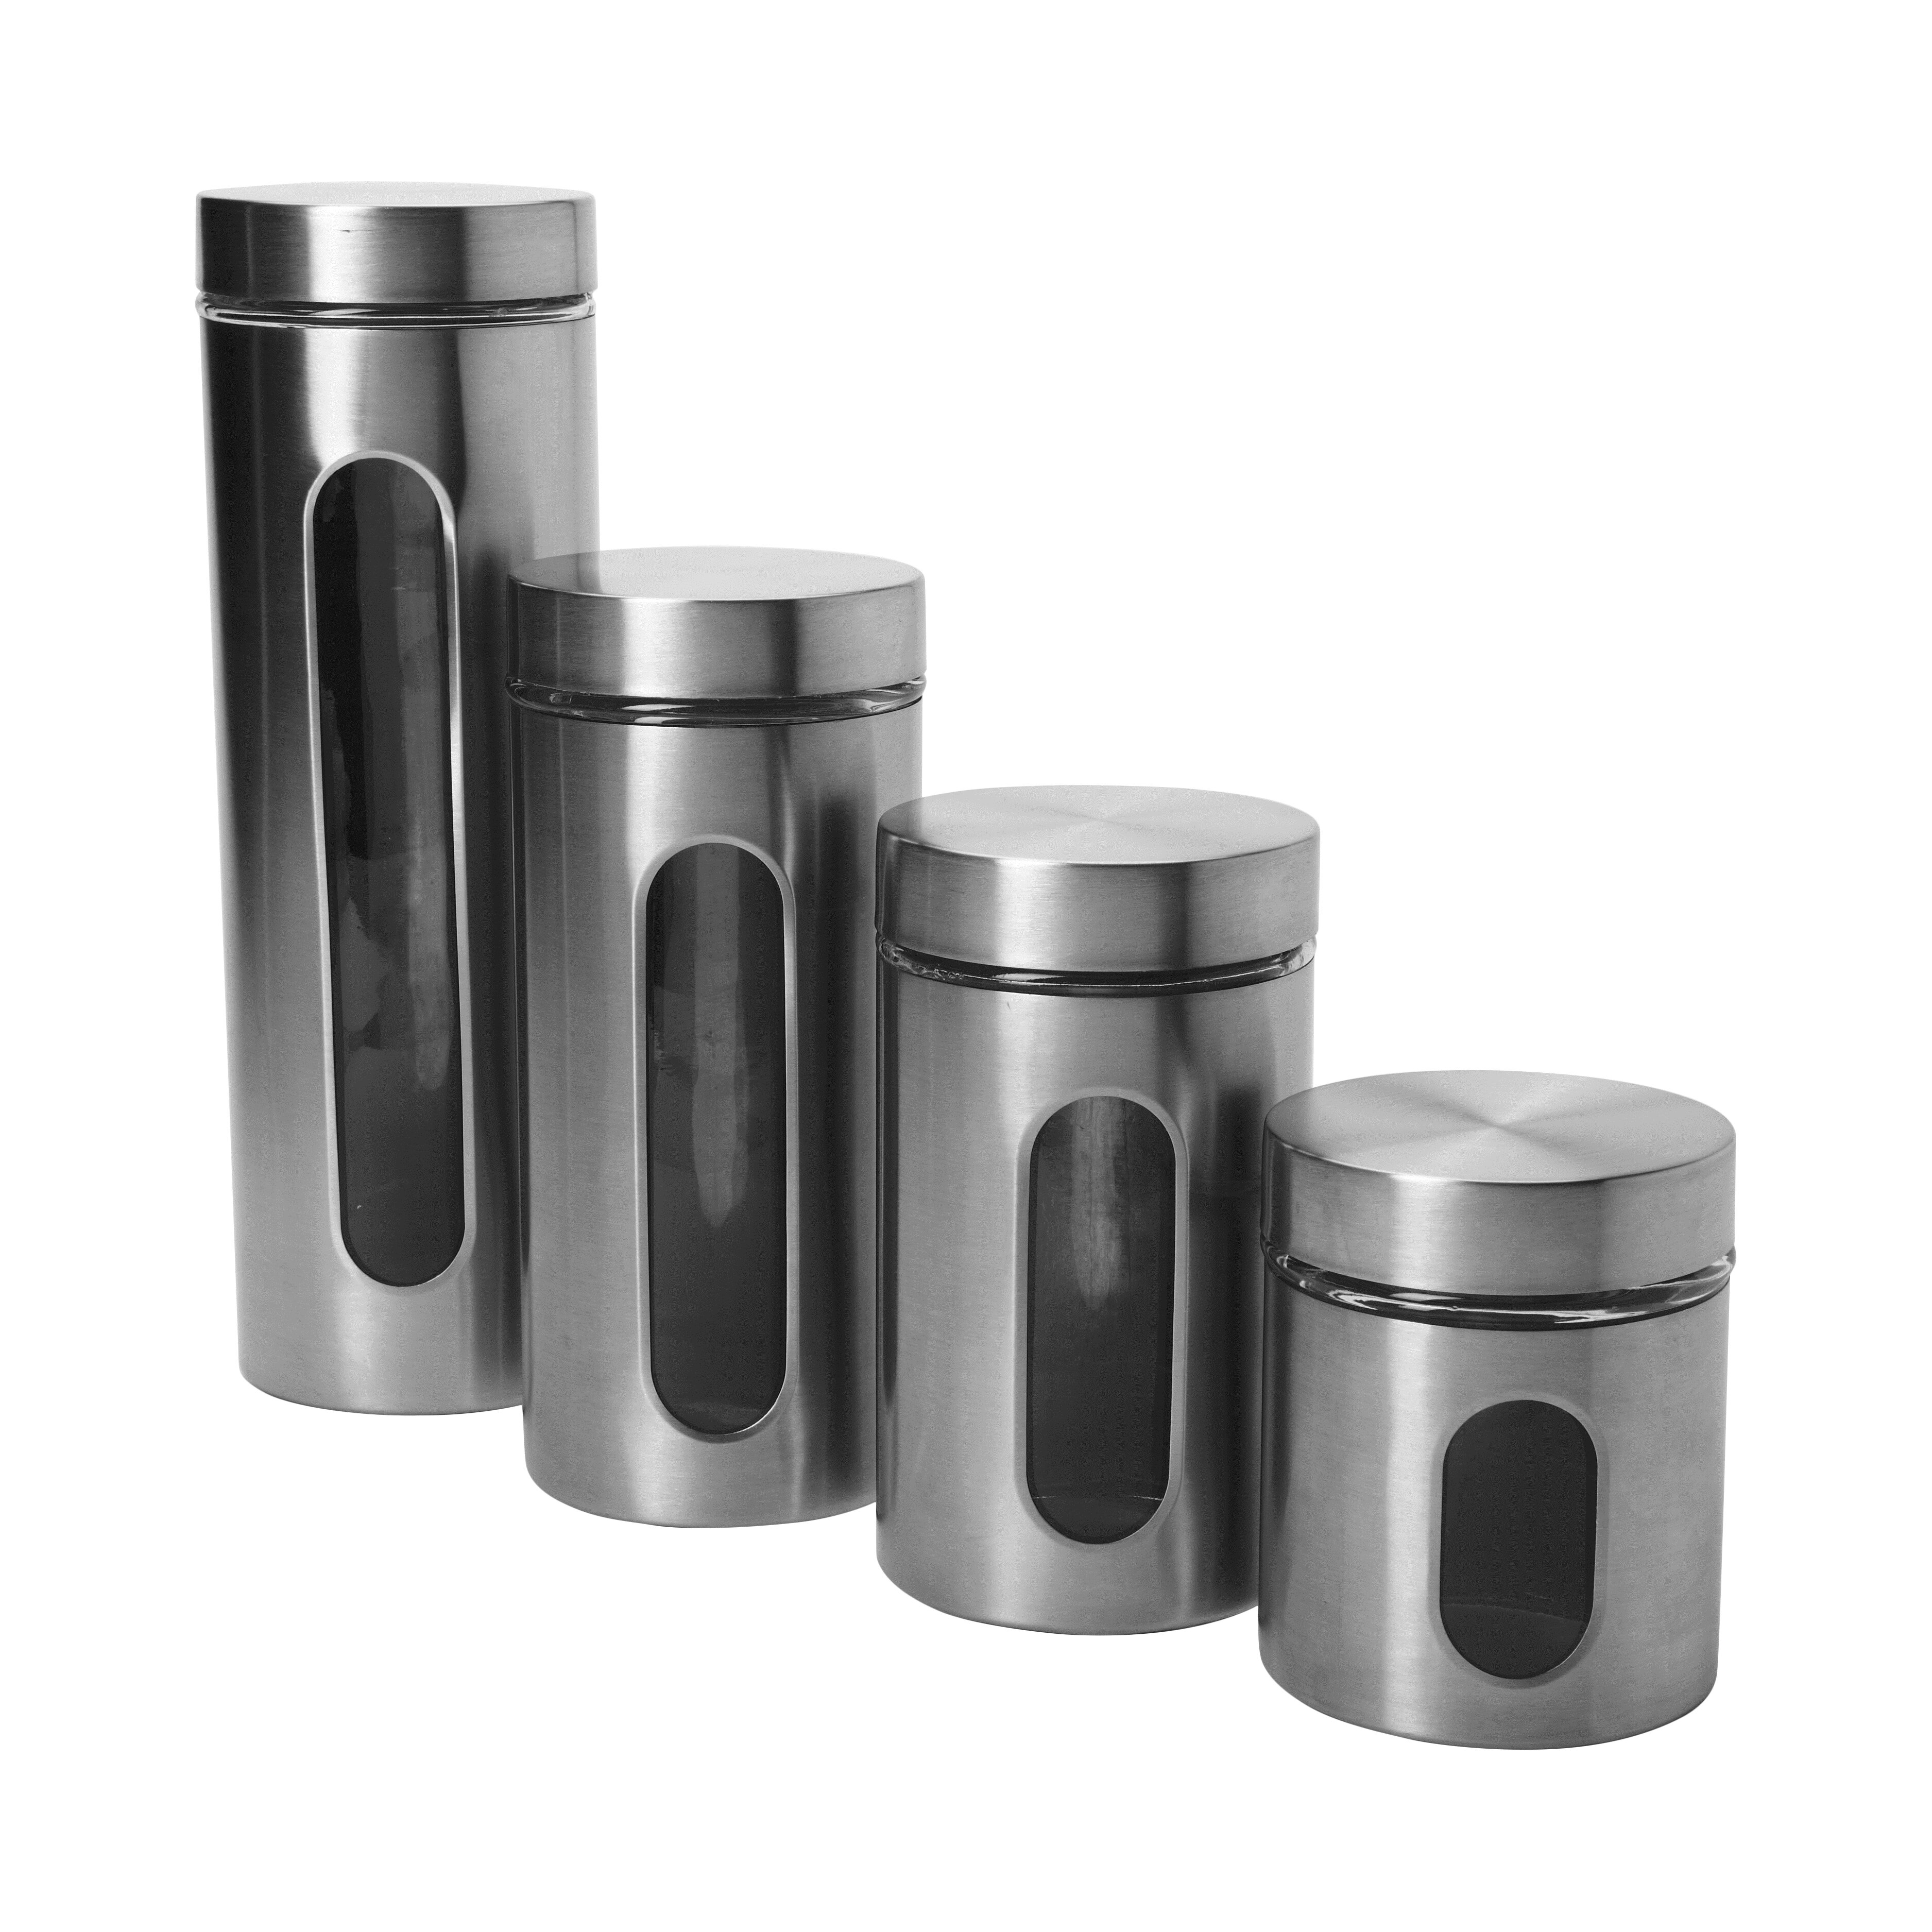 4 piece palladian window canister set wayfair casa cortes 3 piece fleur de lis glass canister set